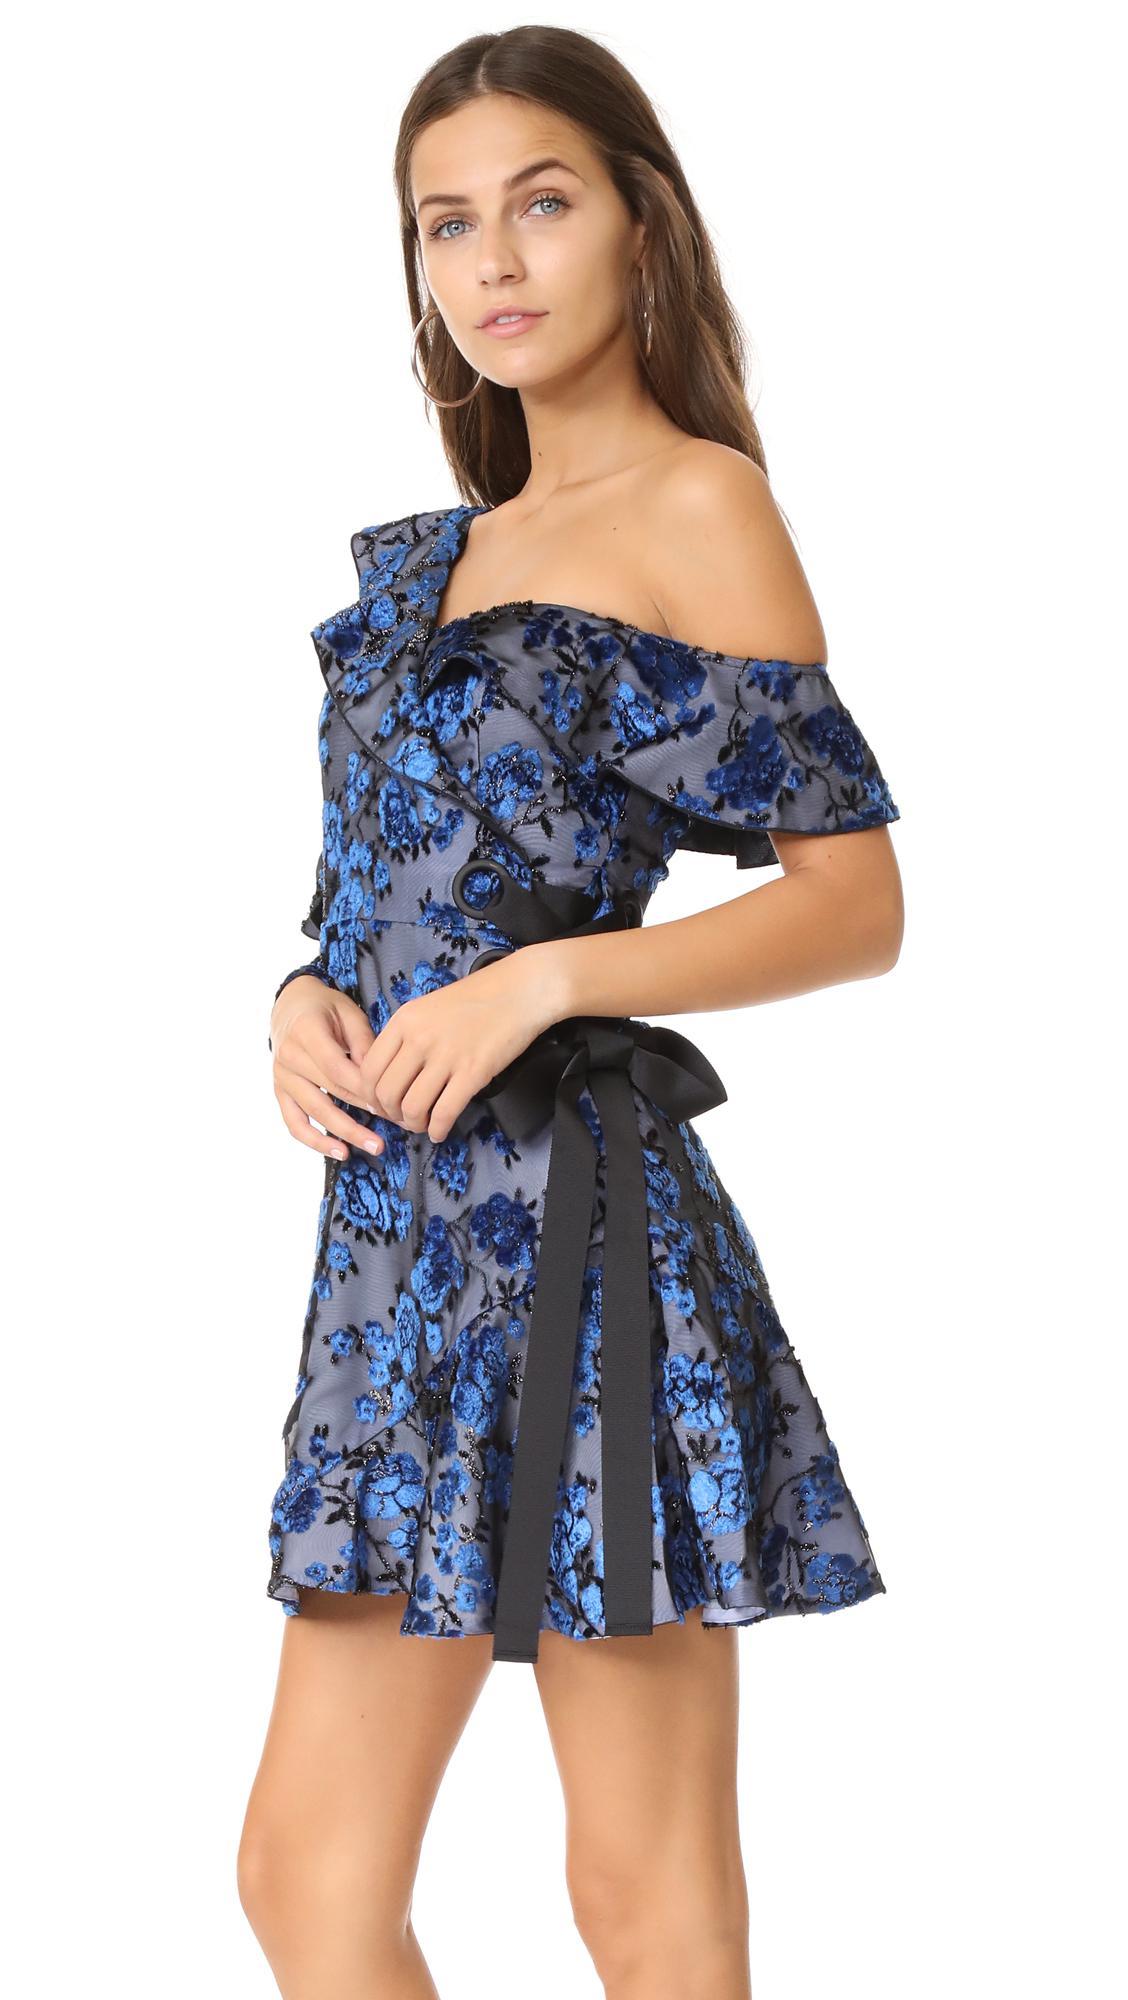 72ddc019619ce Self-Portrait Eyelet Wrap Velvet Mini Dress in Blue - Lyst